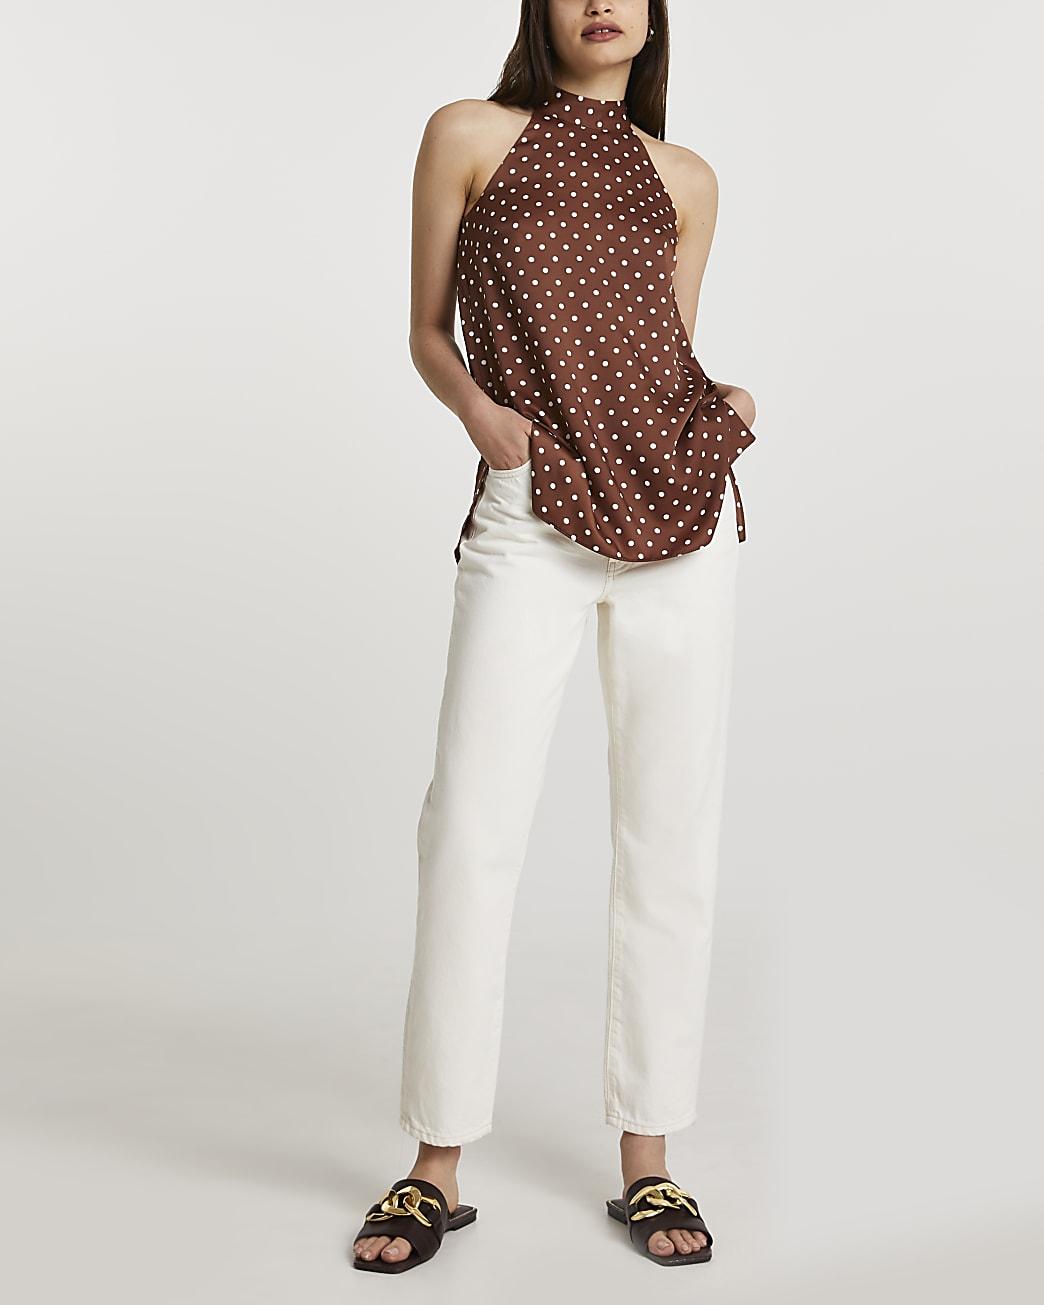 Brown sleeveless halter neck top